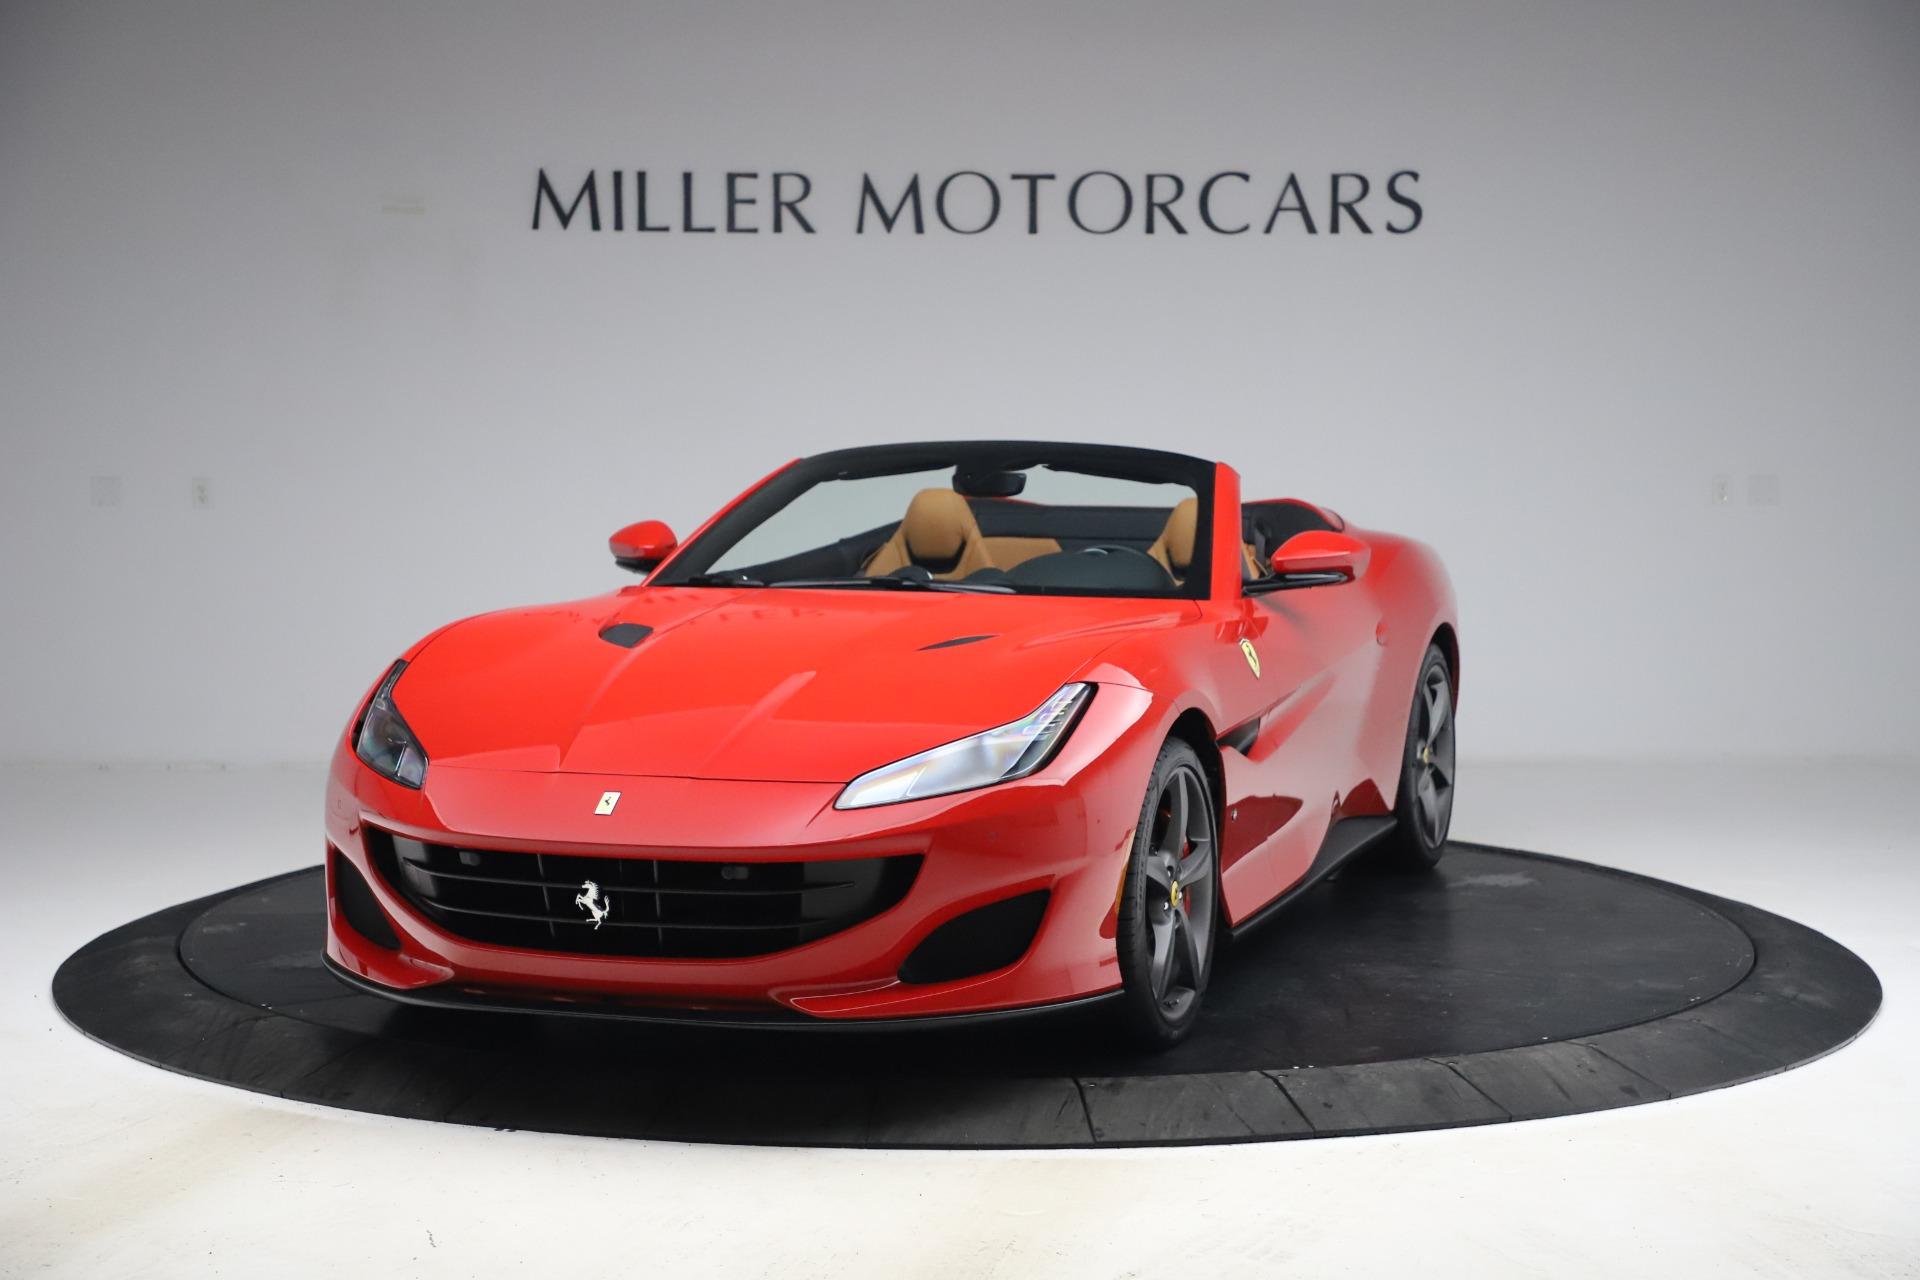 Used 2019 Ferrari Portofino for sale Sold at Maserati of Westport in Westport CT 06880 1